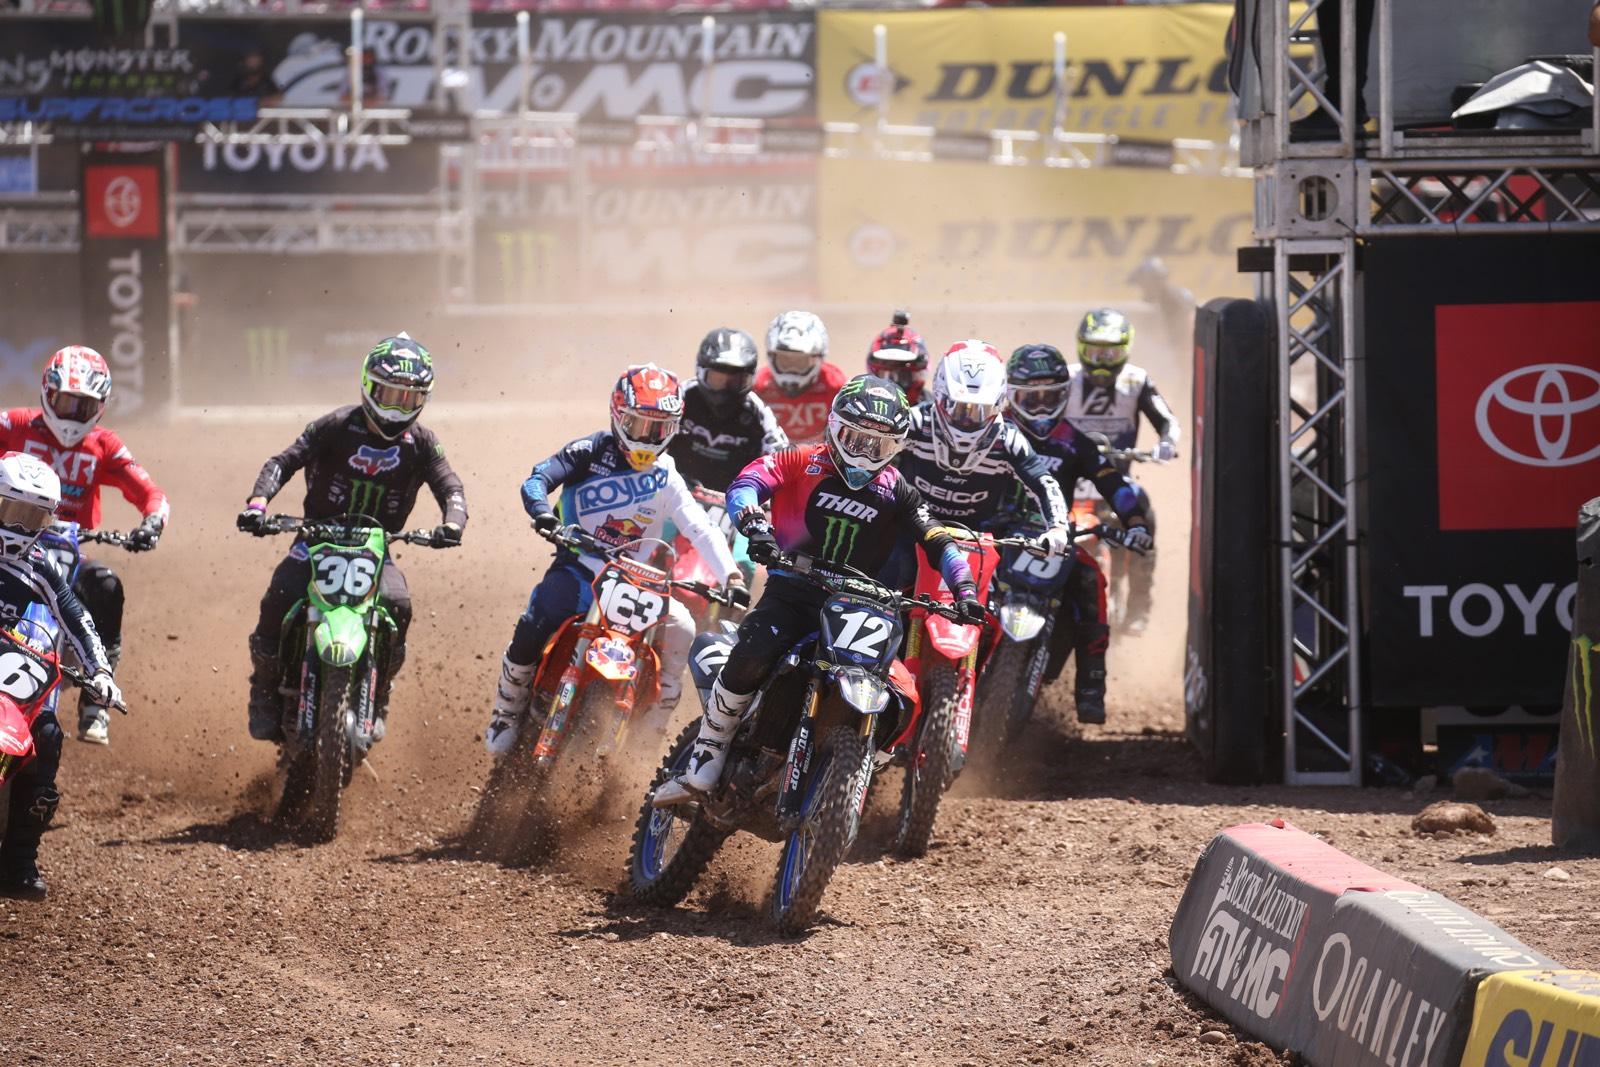 2020 Salt Lake City 1 Supercross - 250 & 450 Highlights